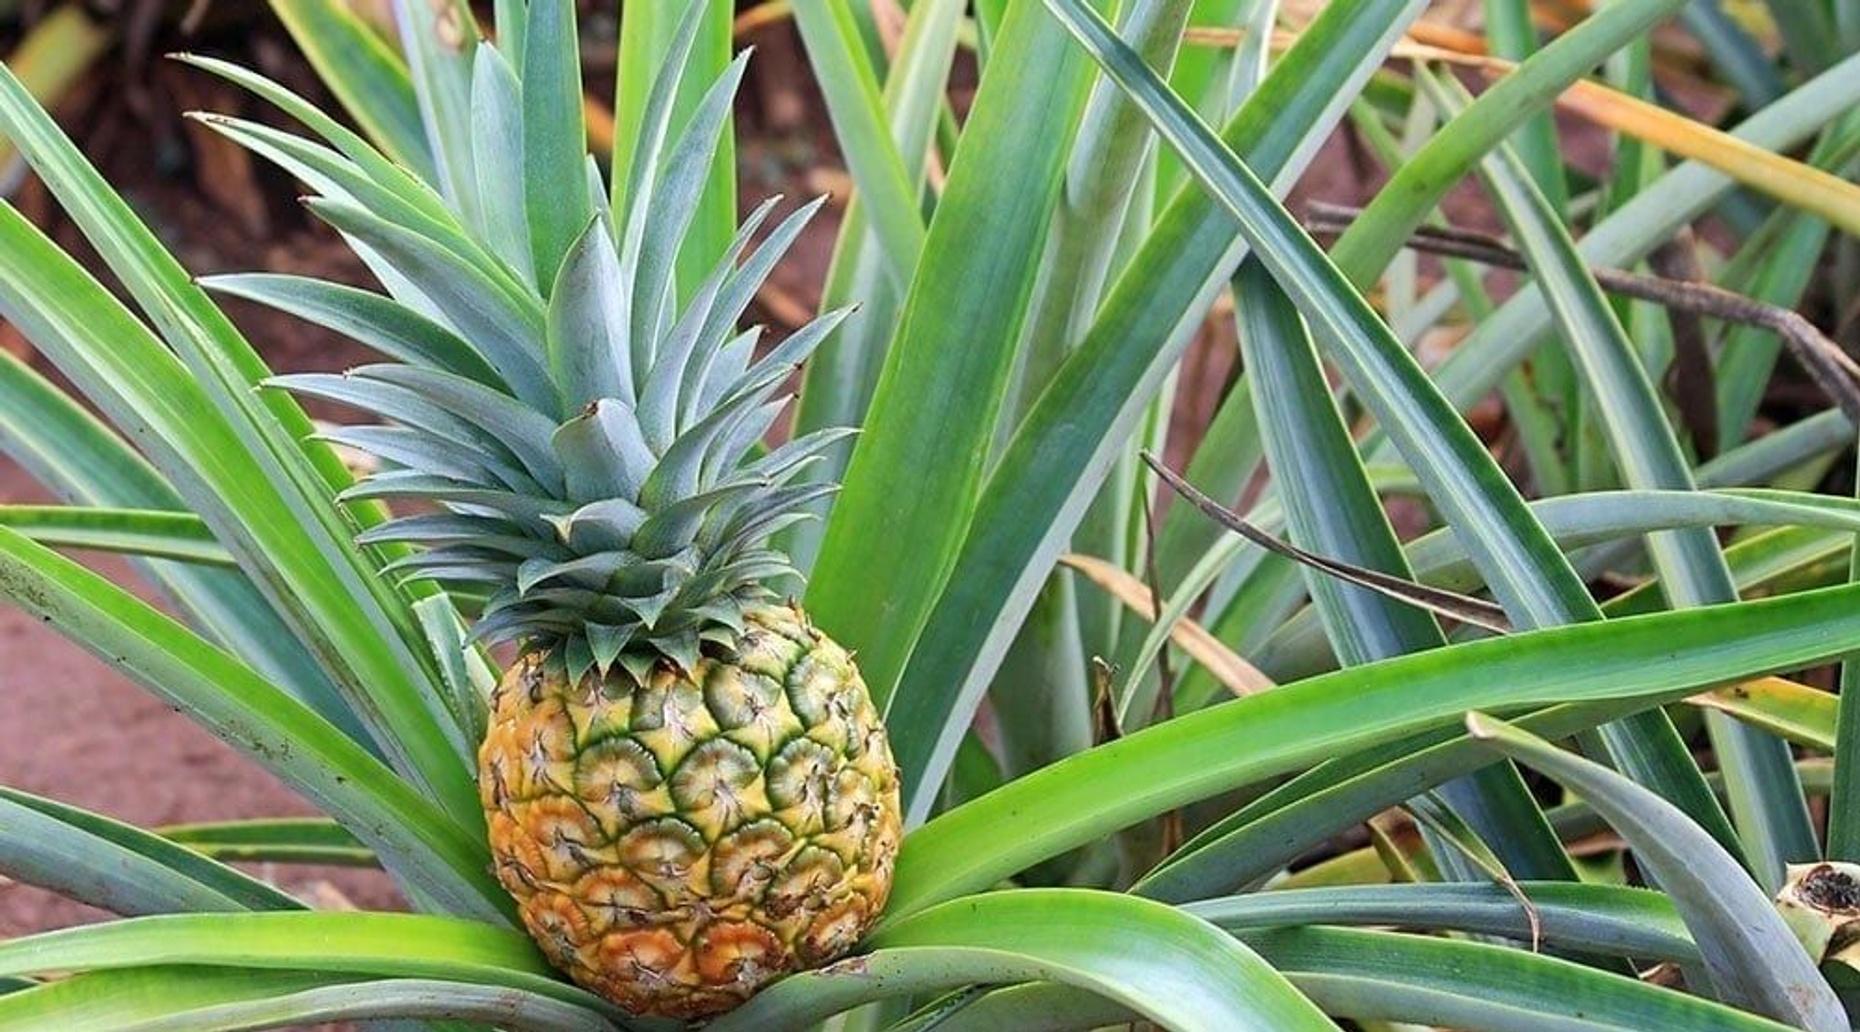 Oahu - Grand Circle Island, Kualoa Ranch & Dole Pineapple Plantation Tour